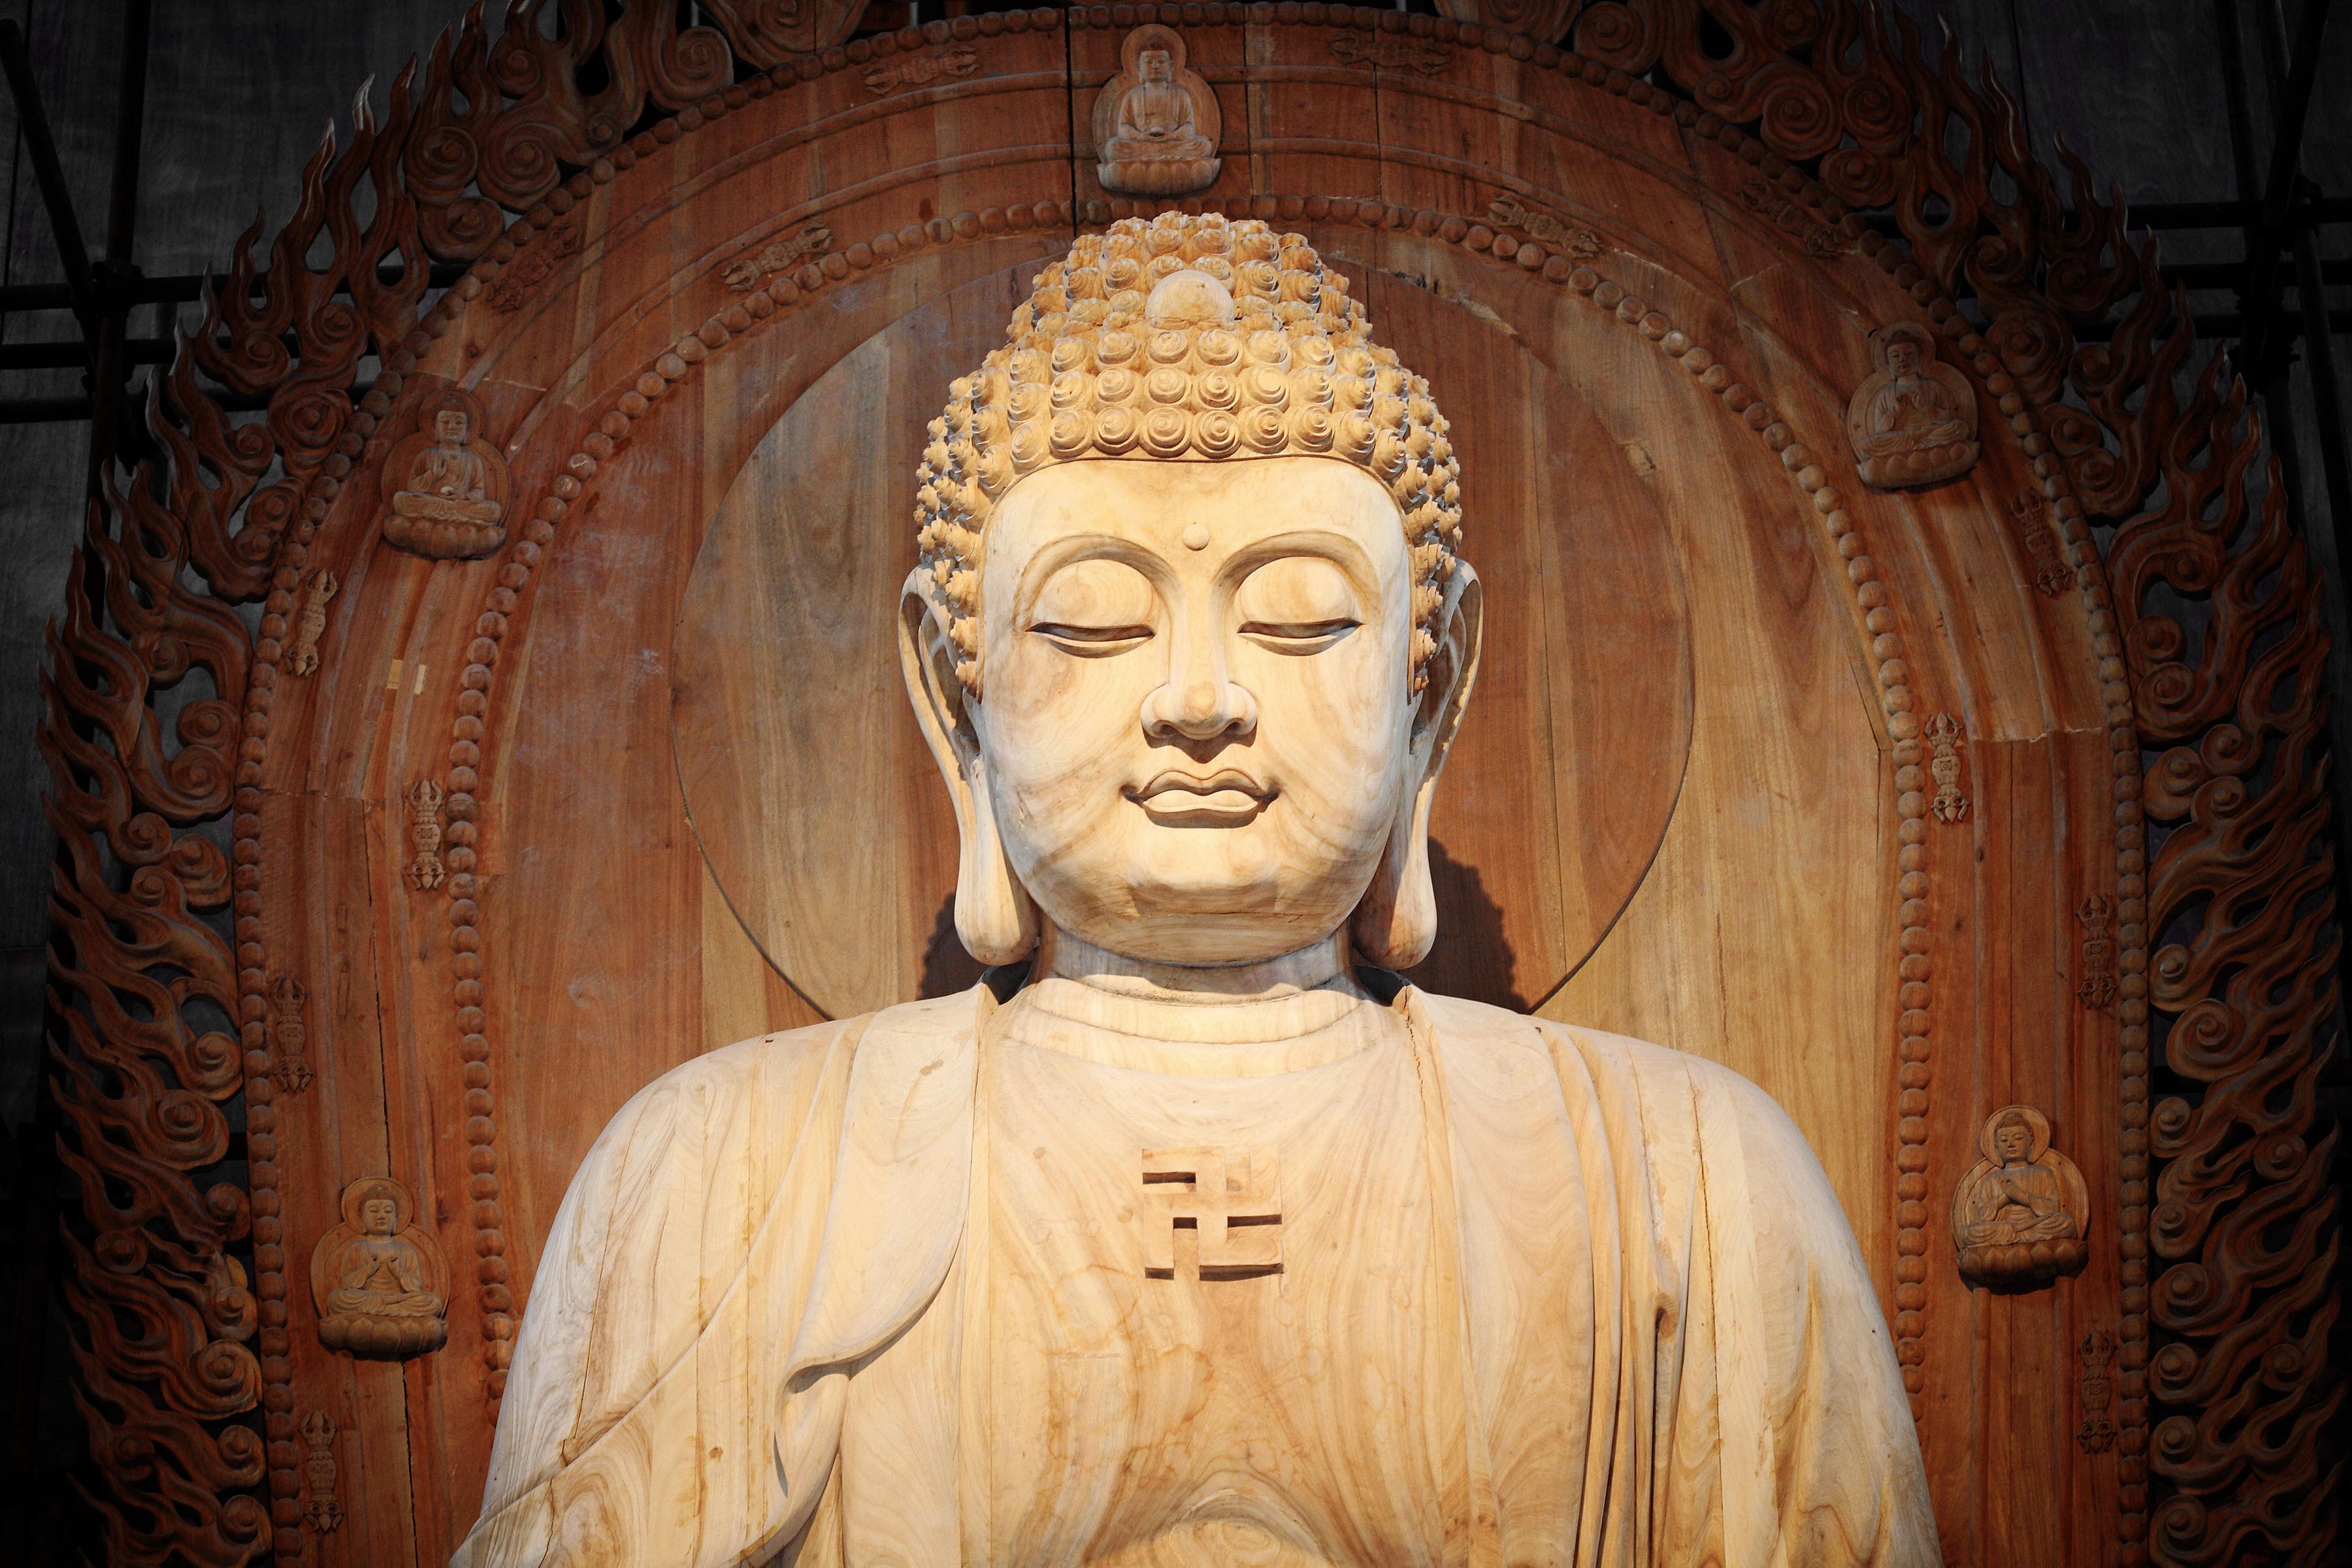 Images Hi Images Shayari Laughing Buddha Statue Hd Image: Buddha Wallpapers High Quality